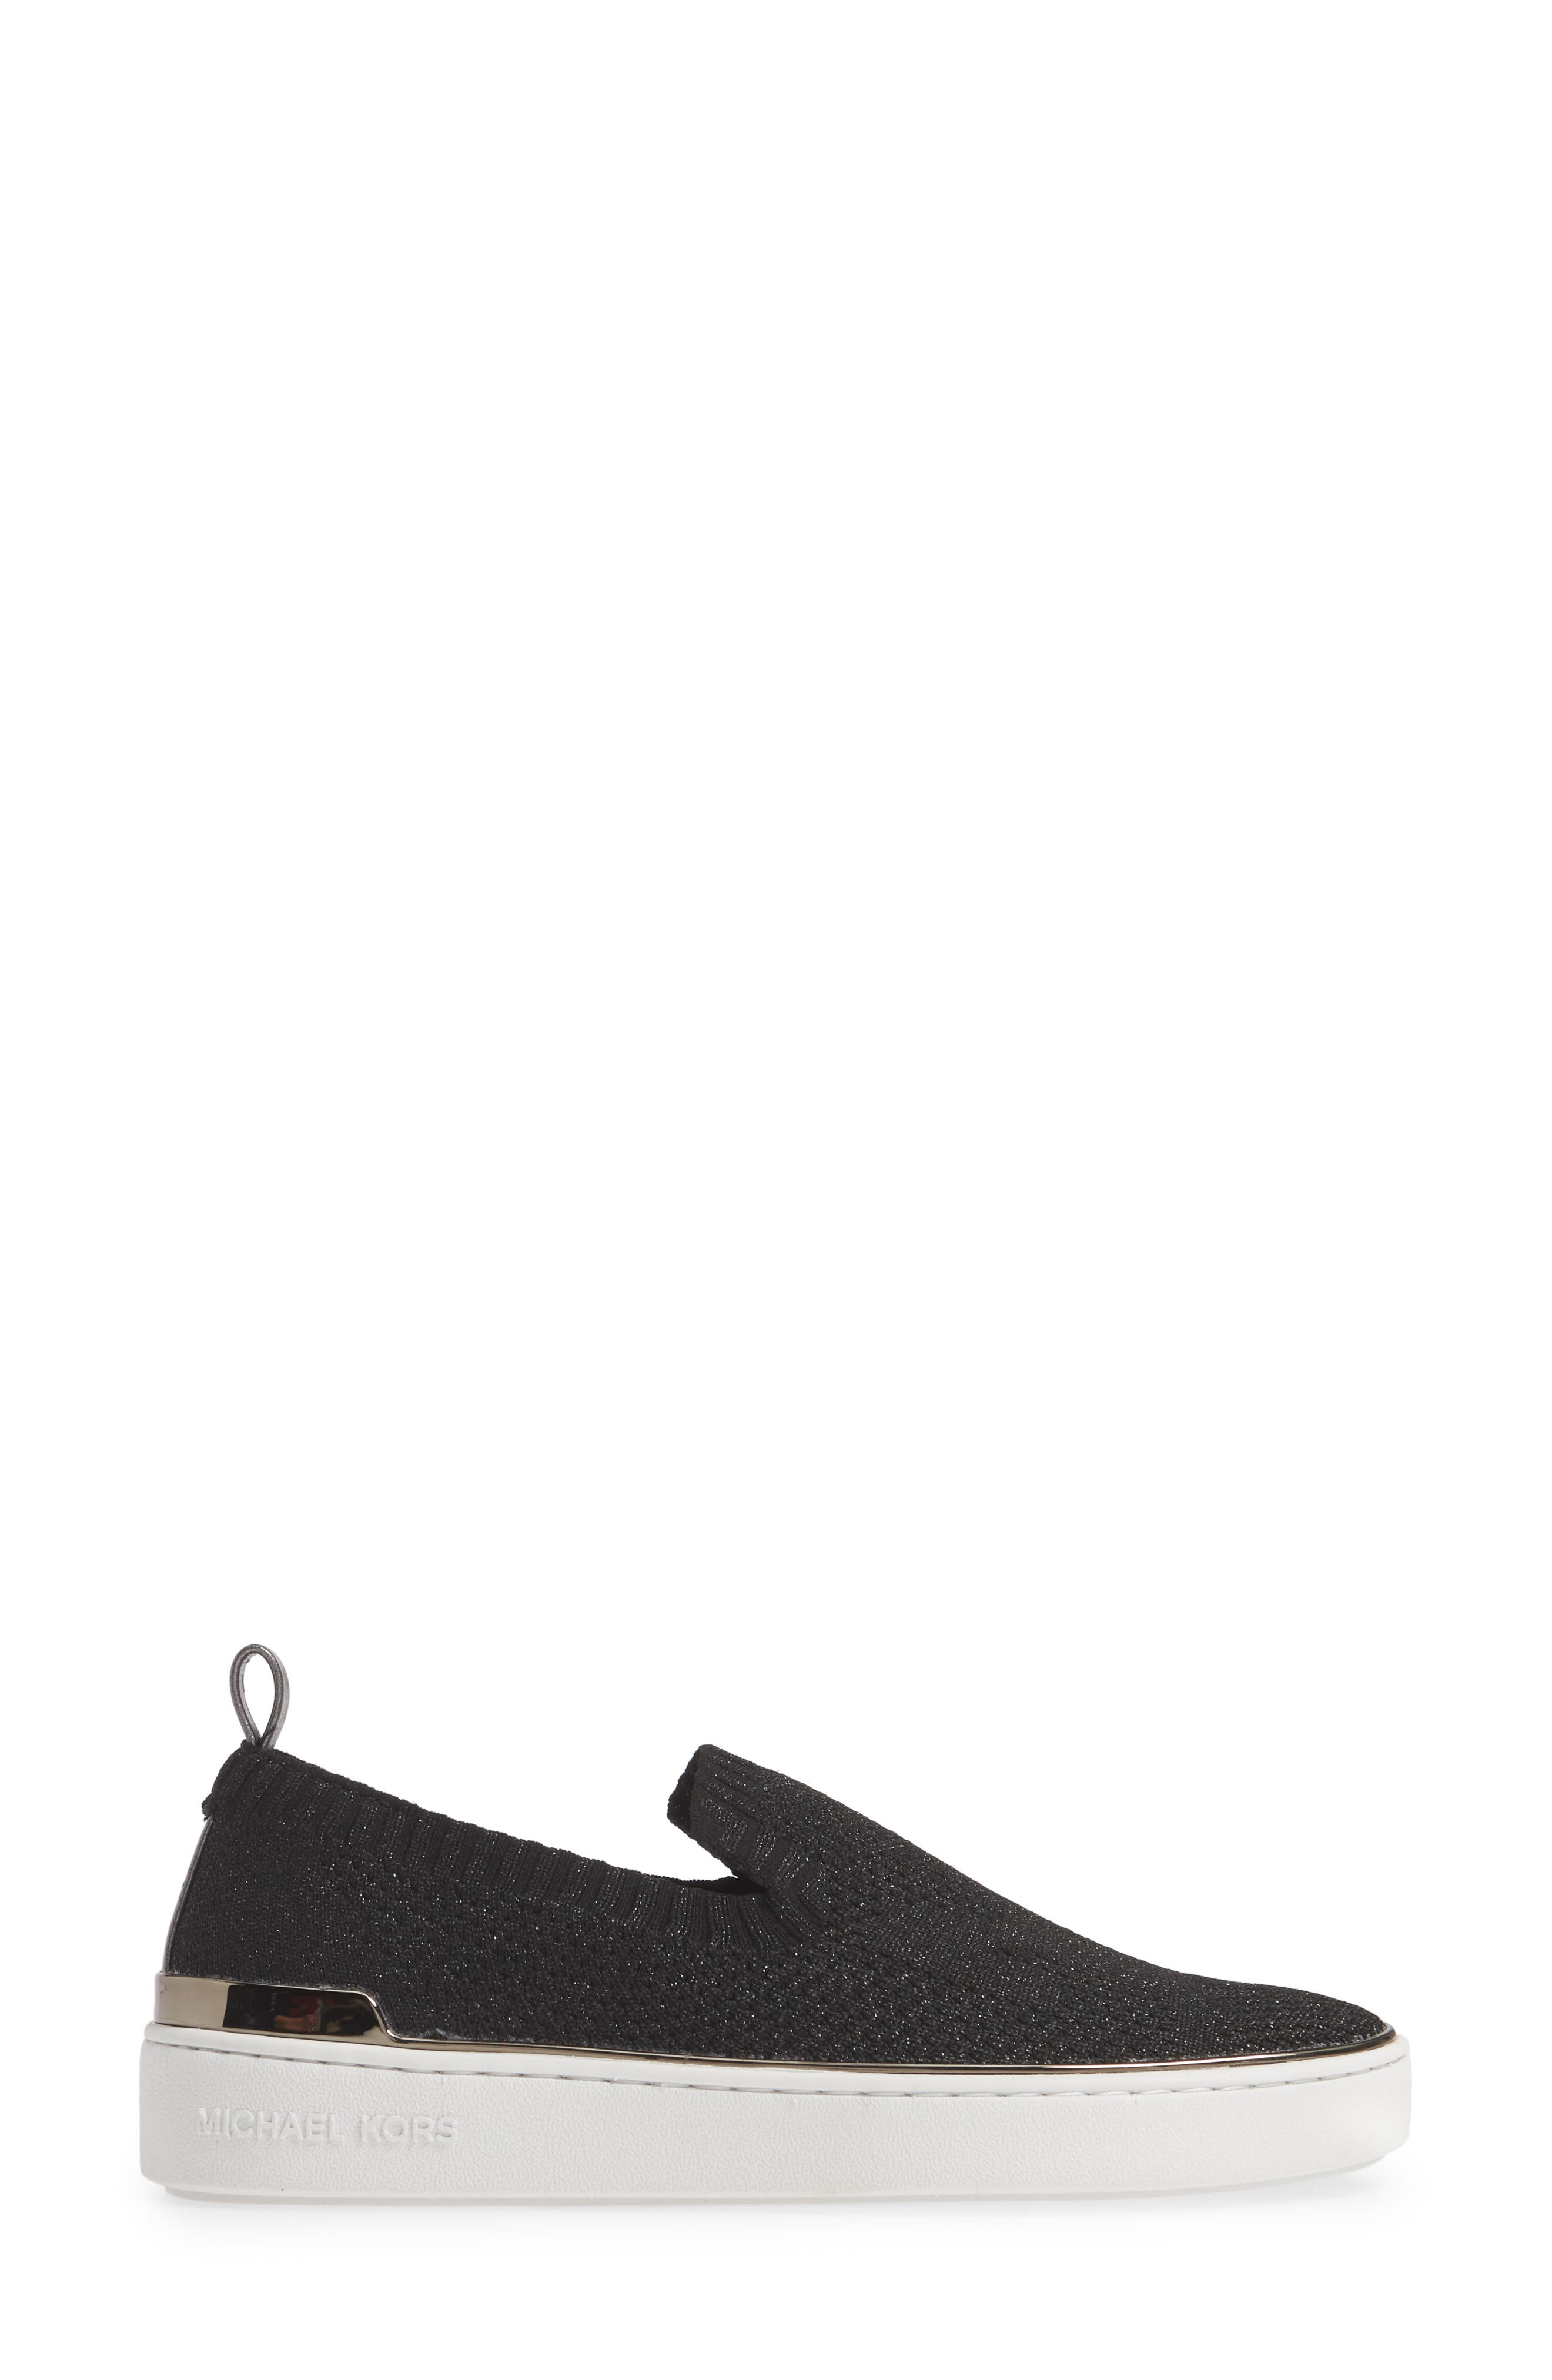 MICHAEL MICHAEL KORS,                             Skyler Sneaker,                             Alternate thumbnail 3, color,                             GUNMETAL FABRIC